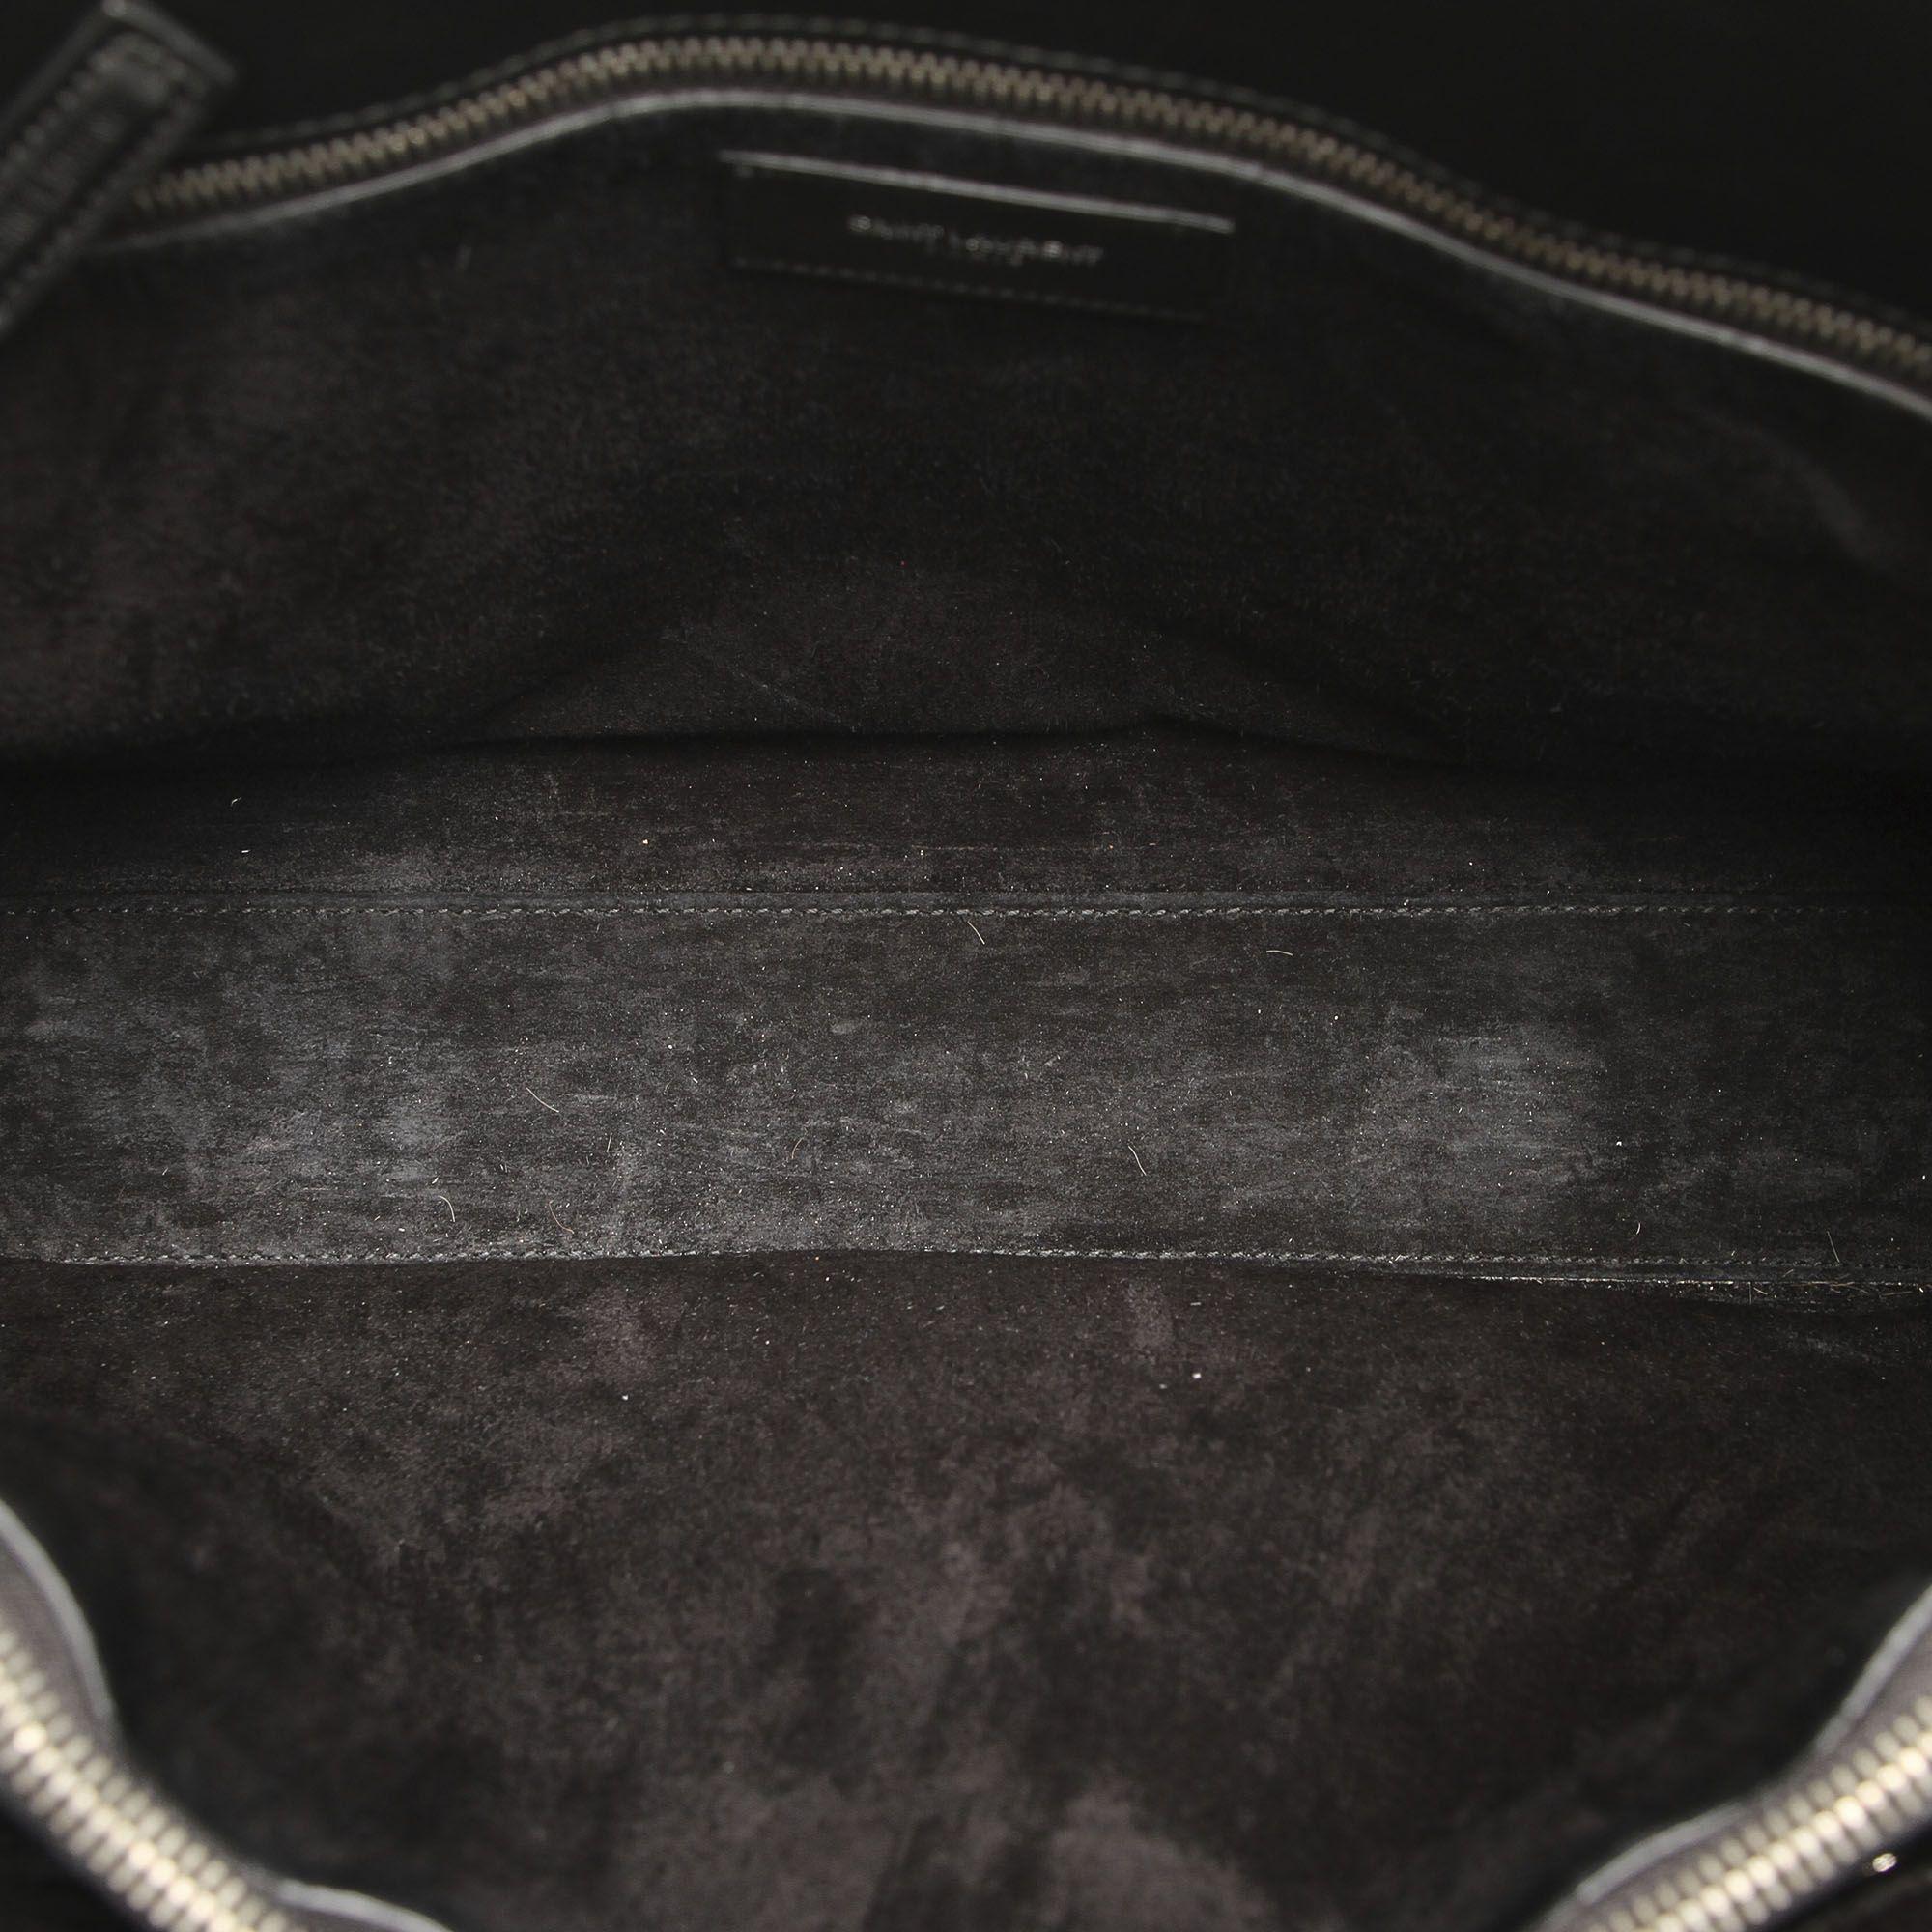 Vintage YSL Sac De Jour Studded Leather Satchel Black